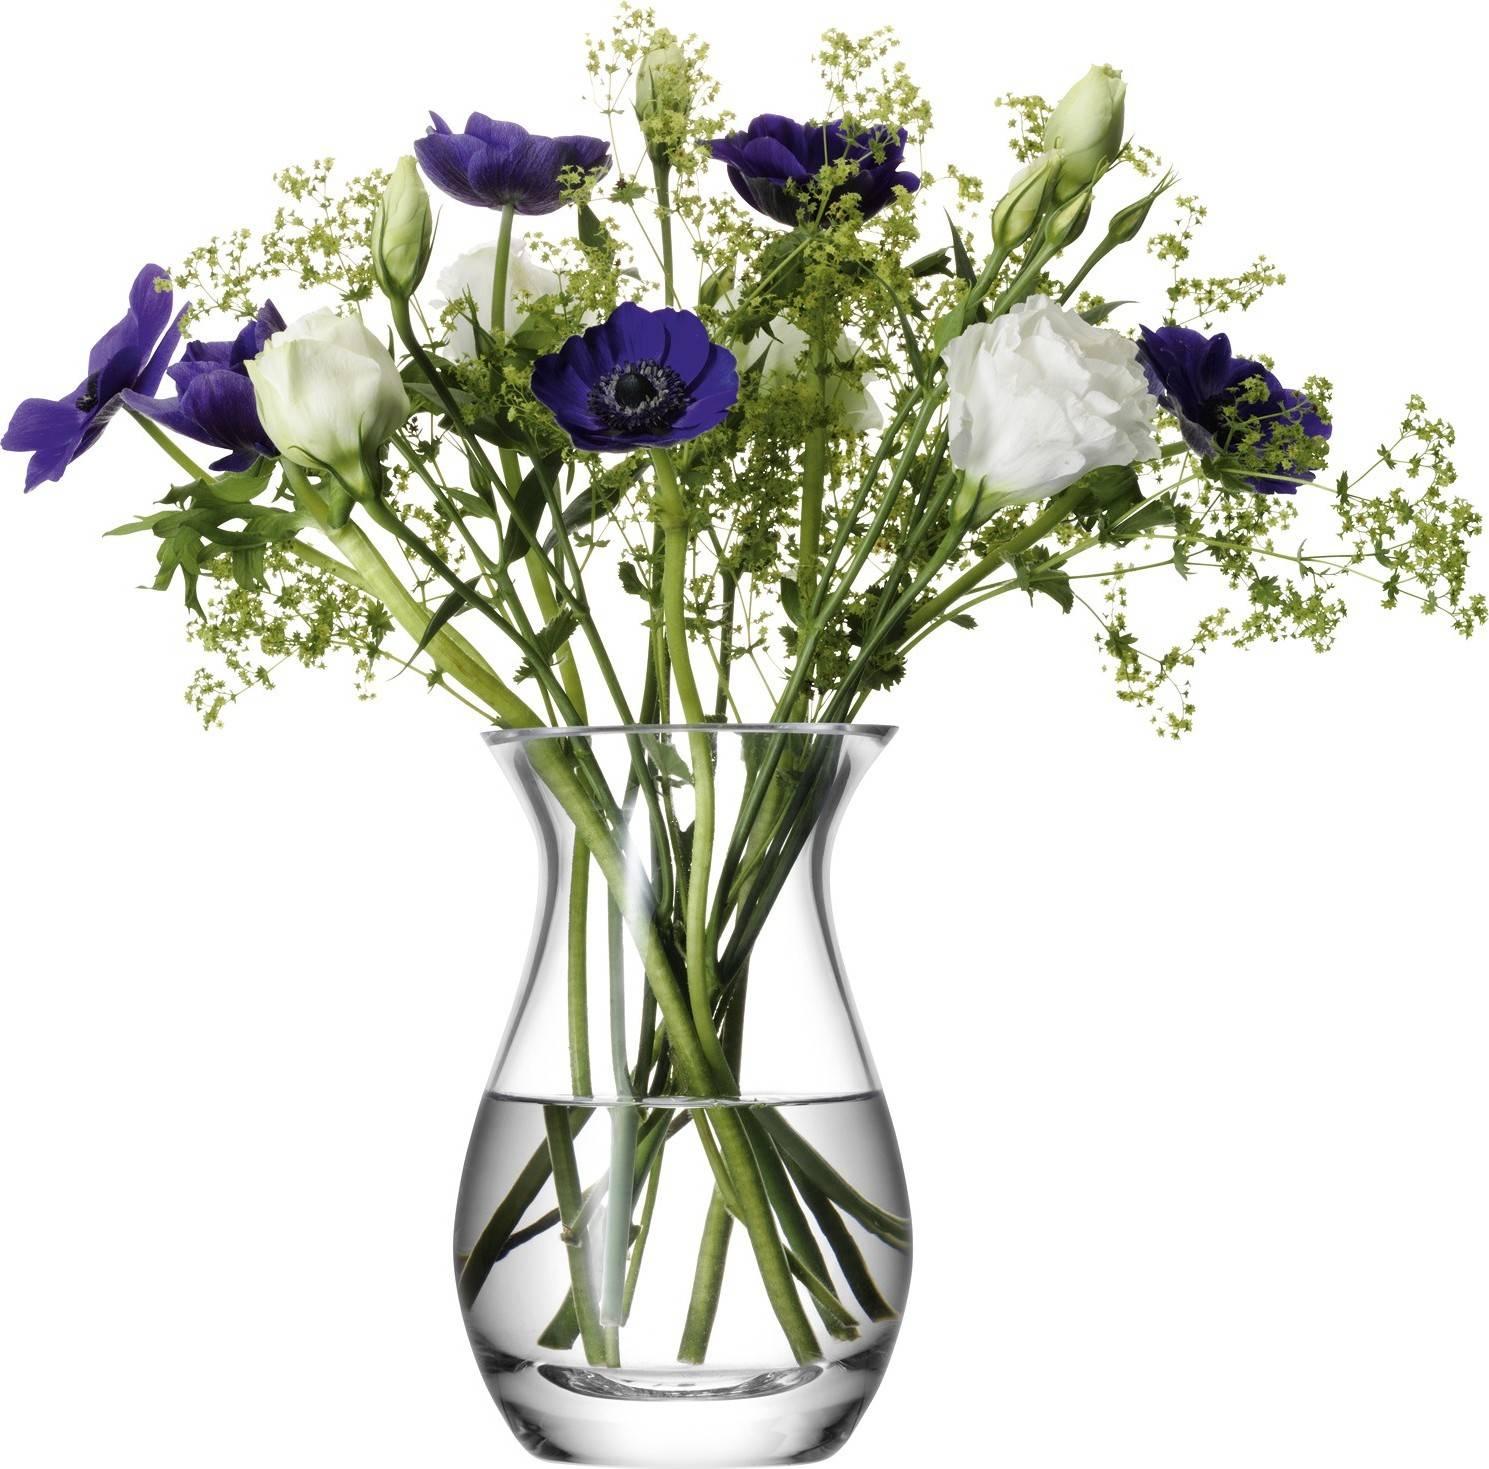 LSA Flower Posy  skleněná váza, 17.5cm, čirá, Handmade G584-18-301 LSA International